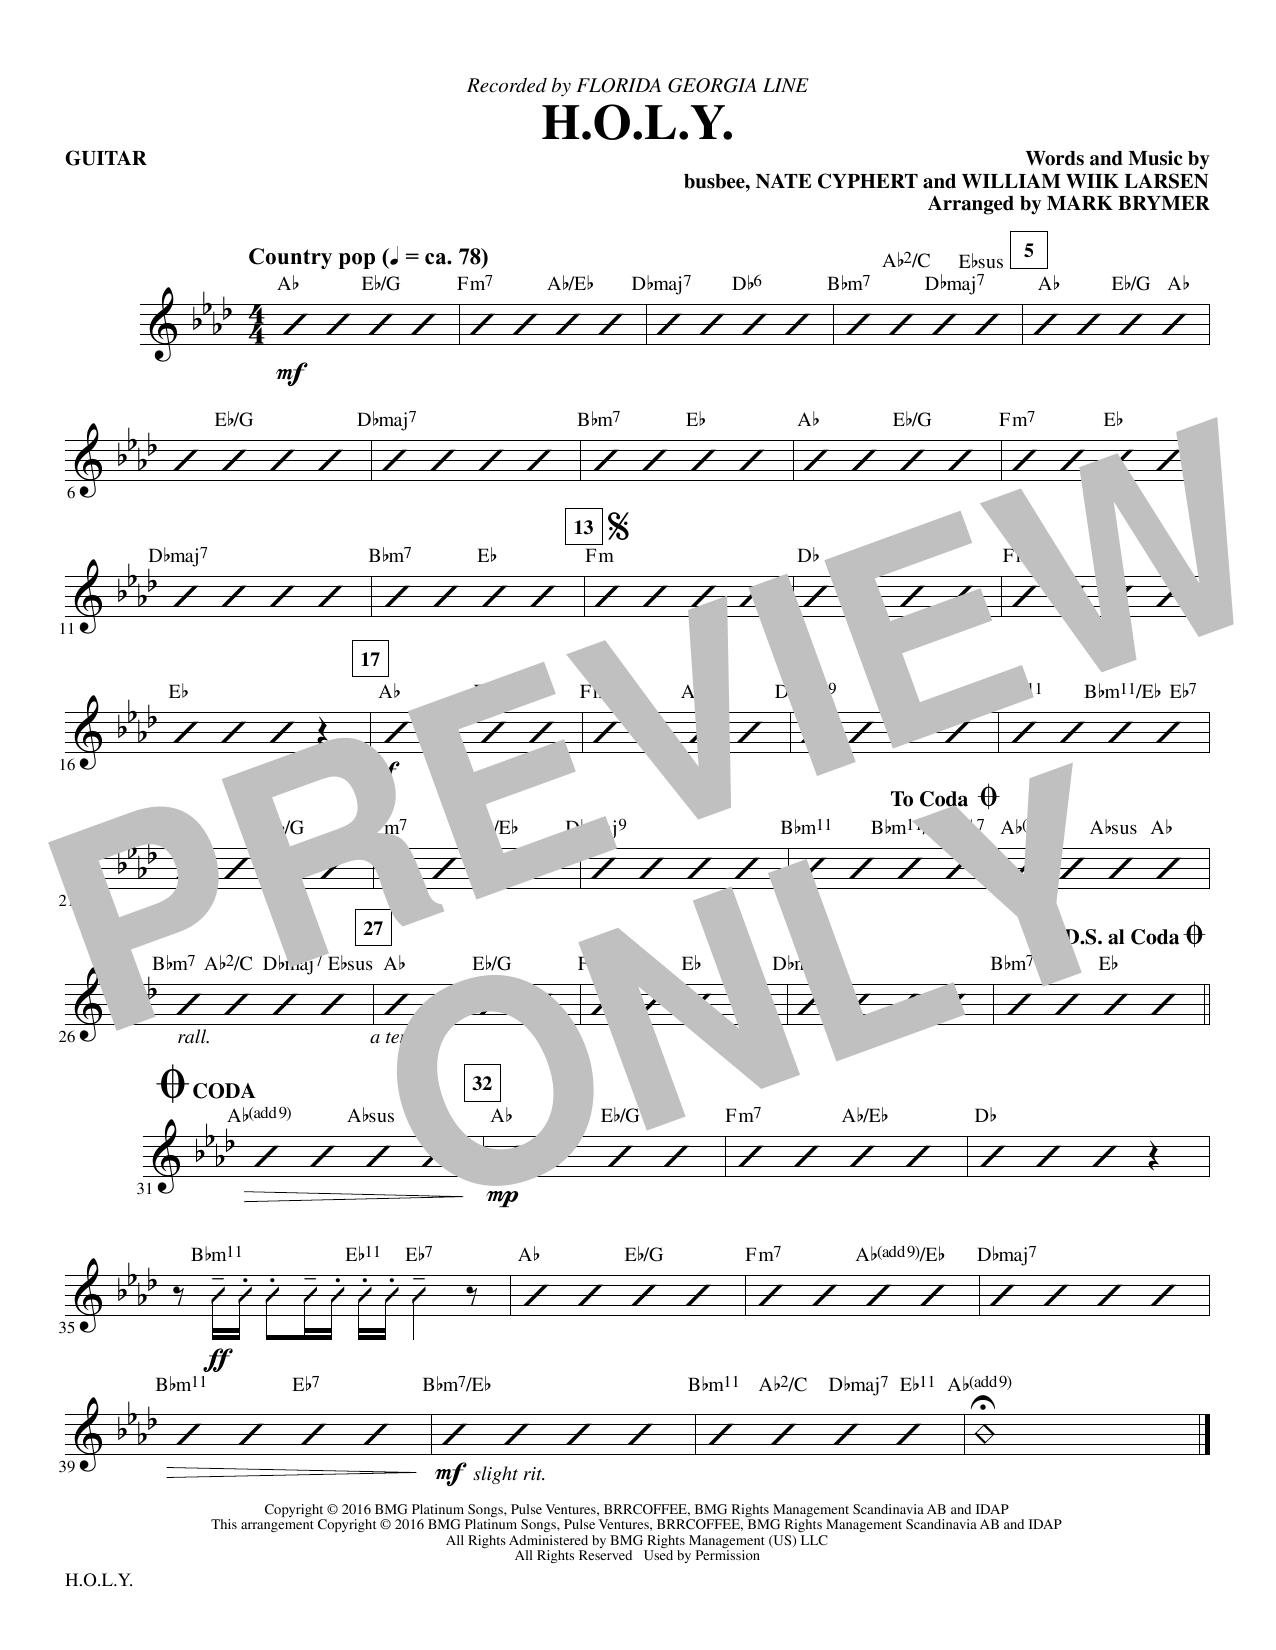 H.O.L.Y. - Guitar Sheet Music